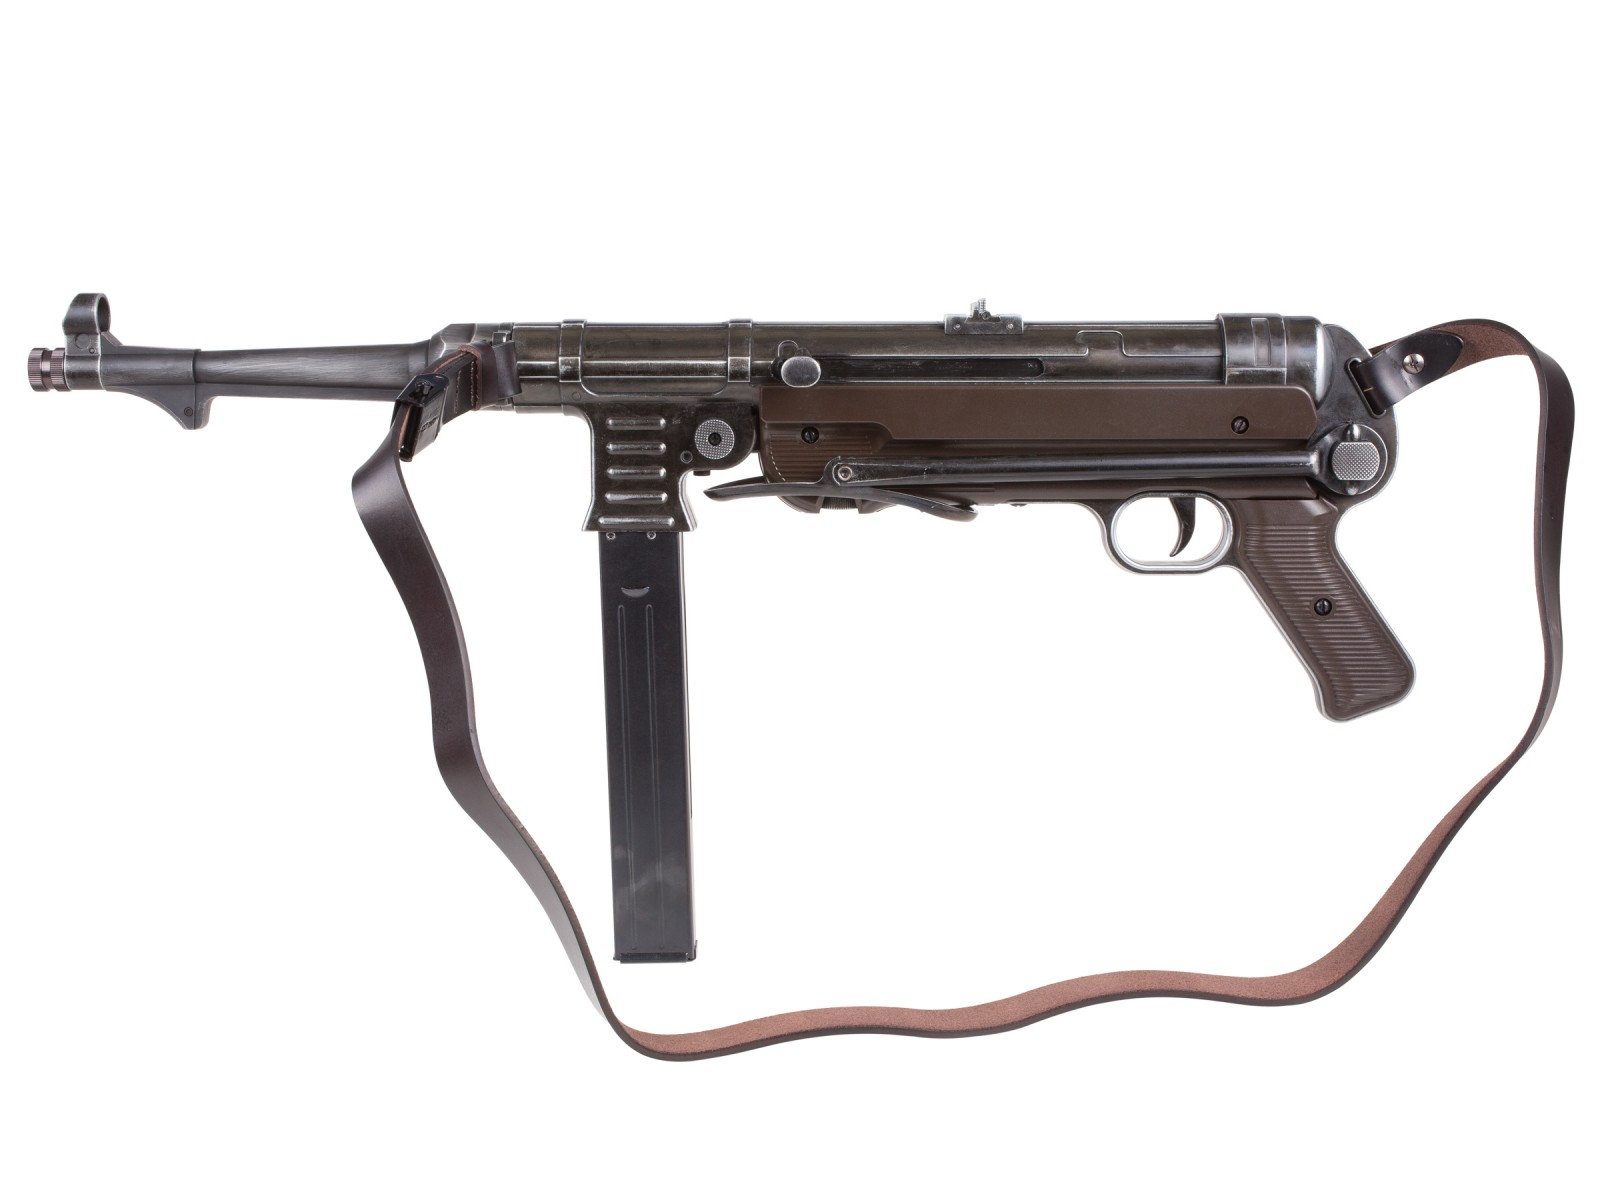 Weathered Legends MP40 BB Submachine Gun w/ Leather Strap